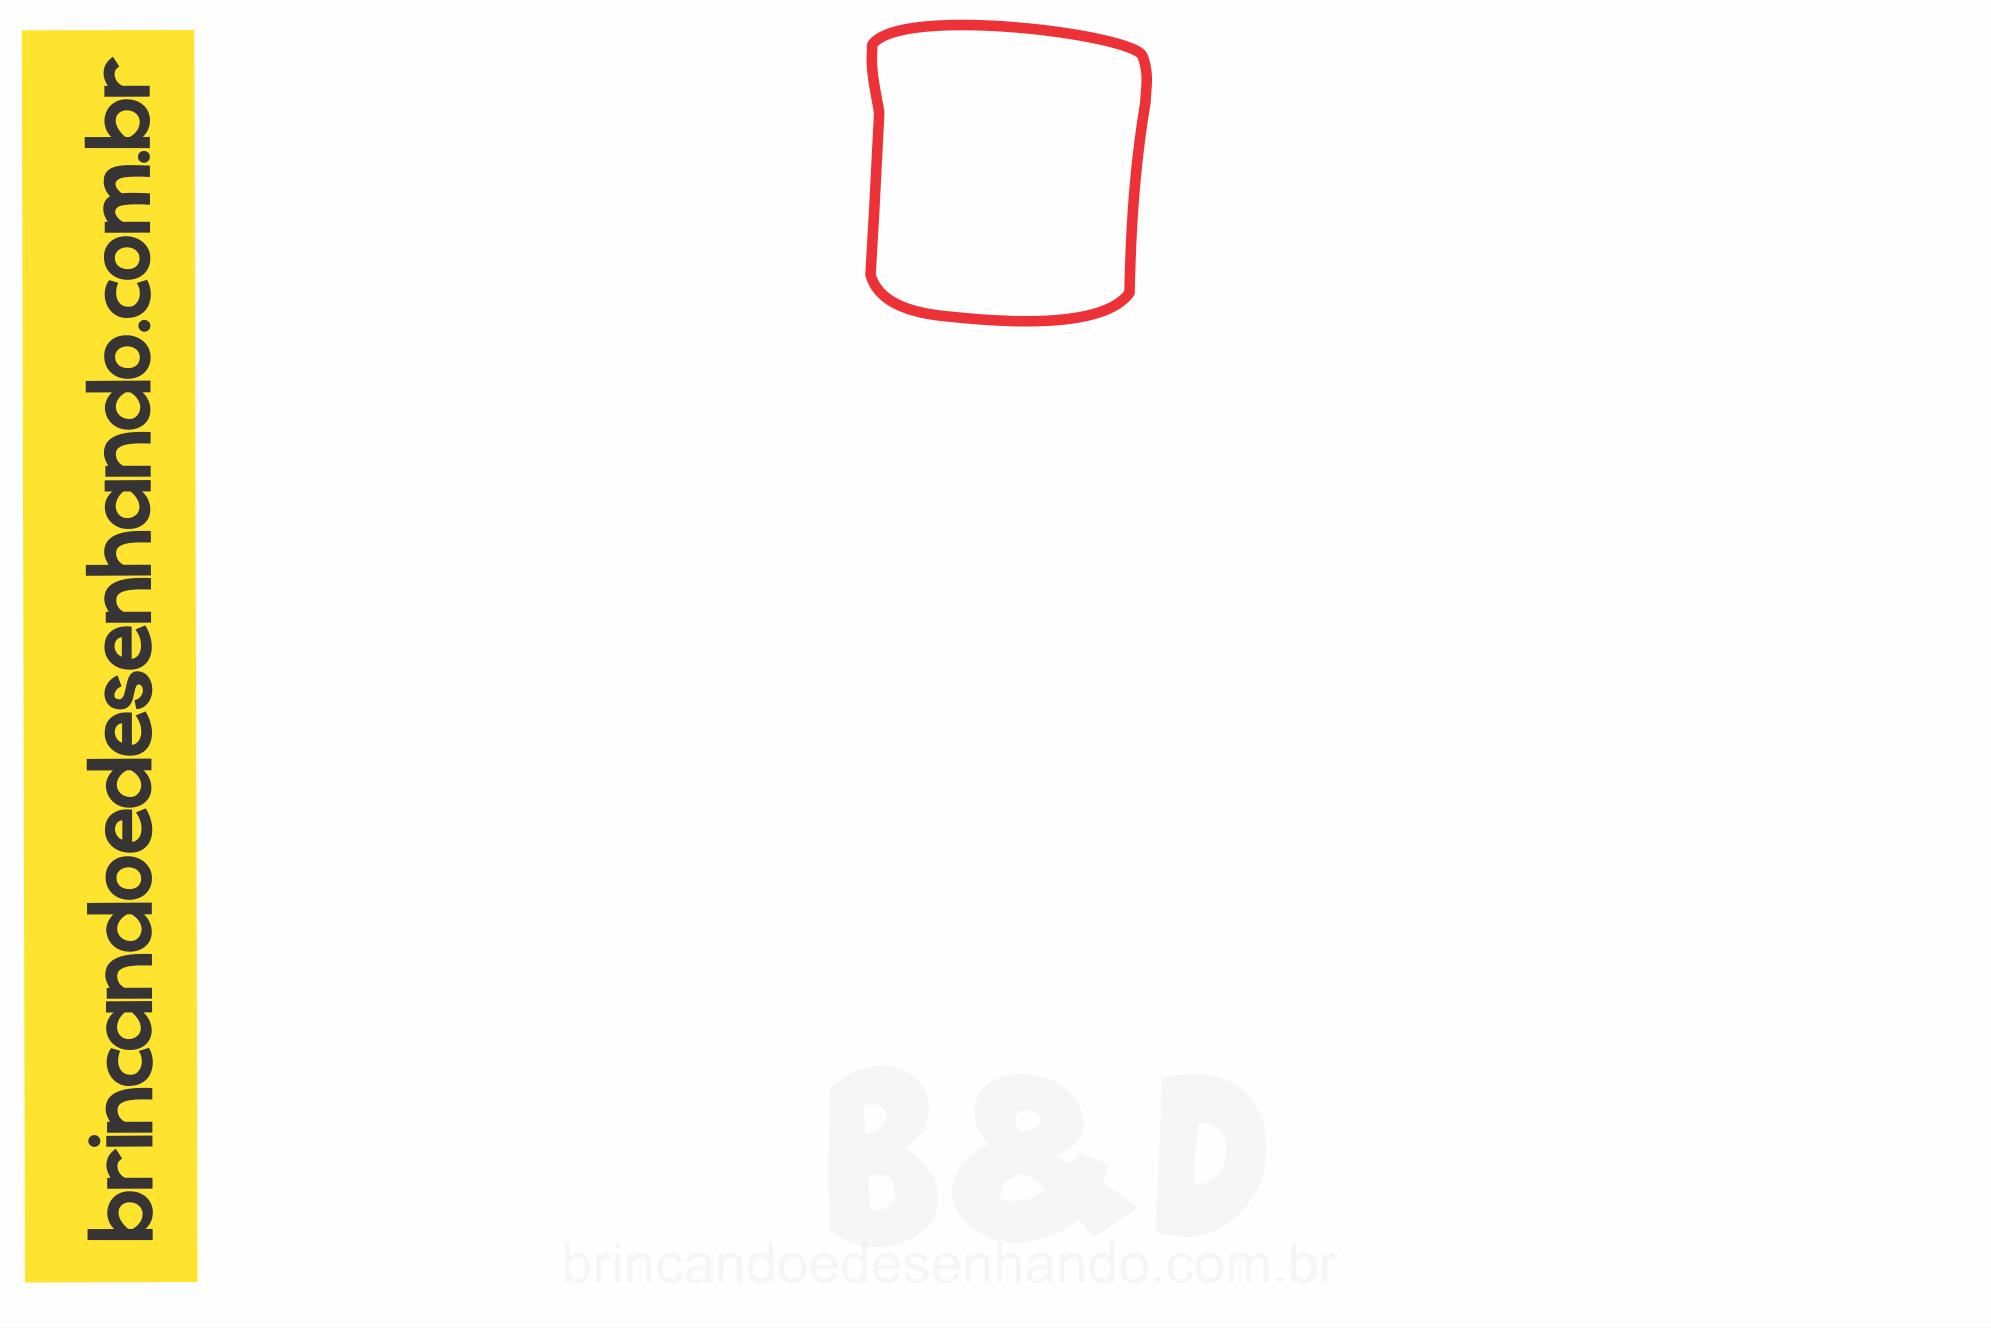 Como Desenhar O Dj Marshmallow Brincando E Desenhando